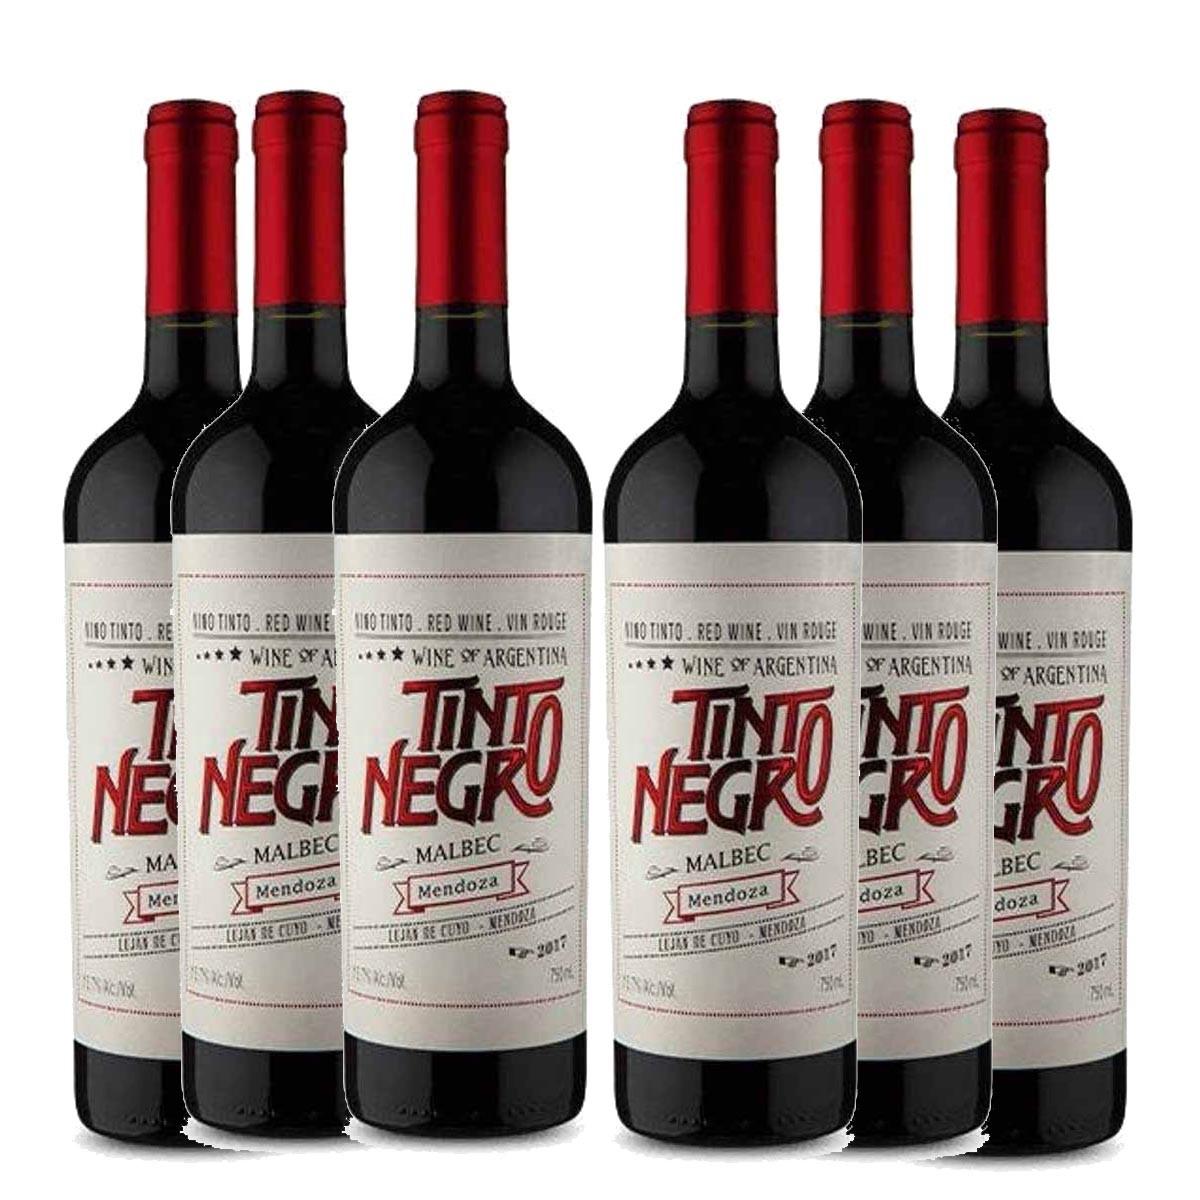 Kit 6 Vinhos Tinto Argentino Negro Mendoza Malbec 2018